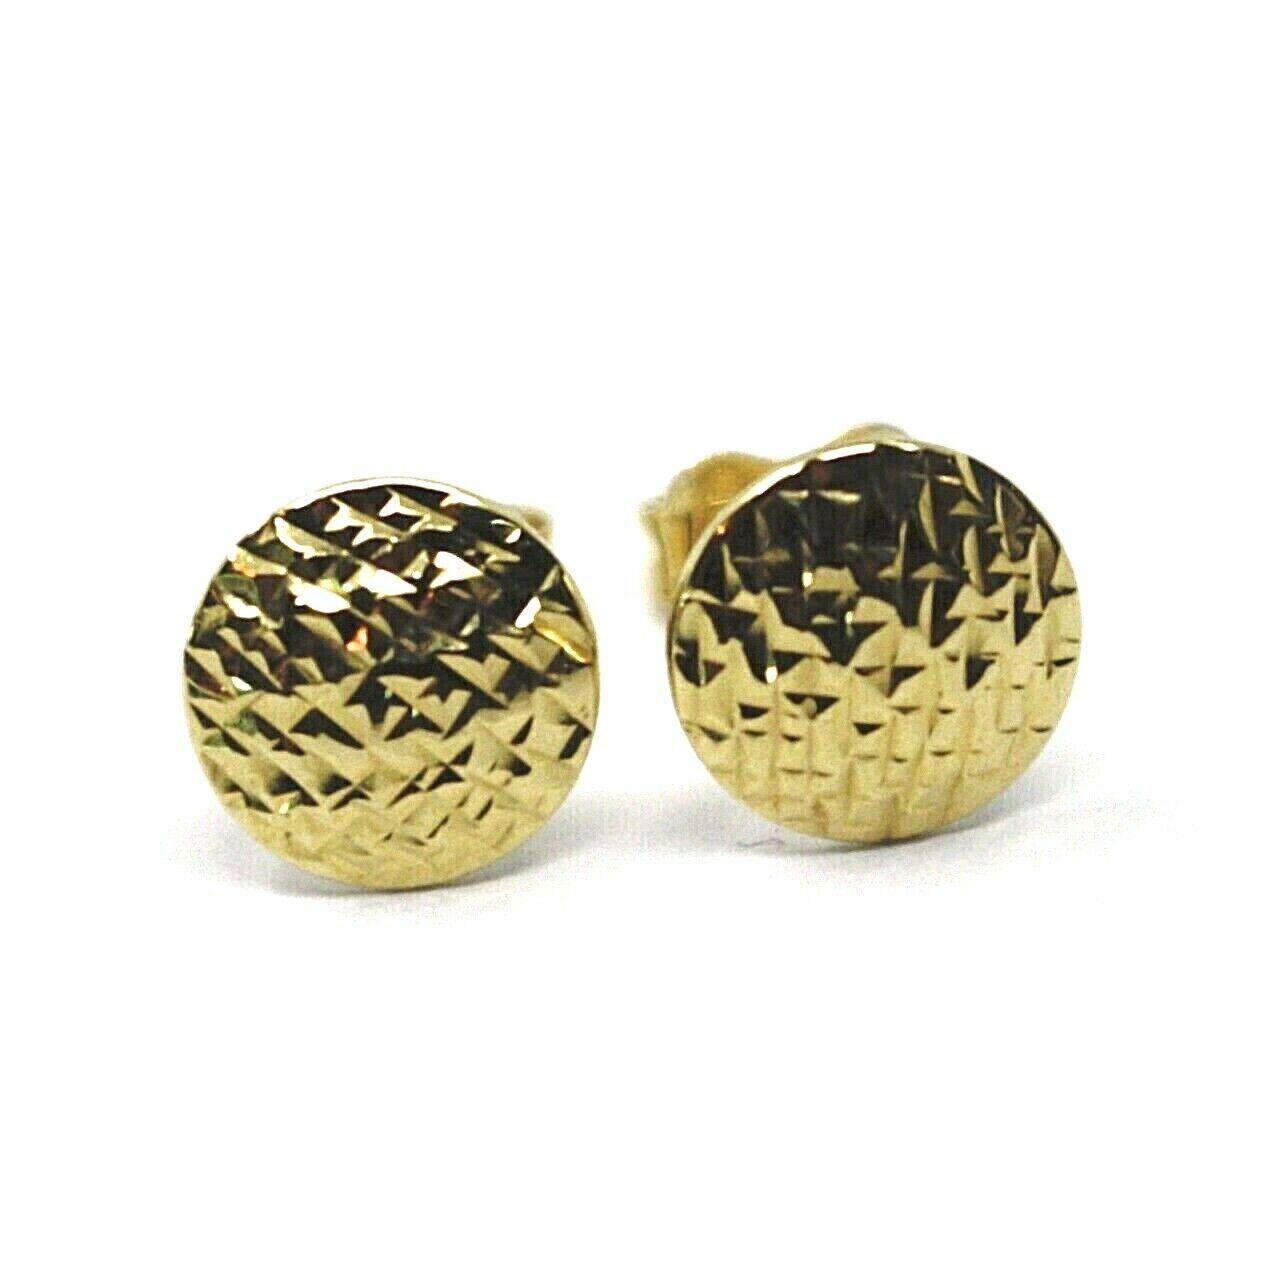 18K YELLOW GOLD BUTTON EARRINGS, DIAMOND CUT WORKED DISCS, 8mm DIAMATER